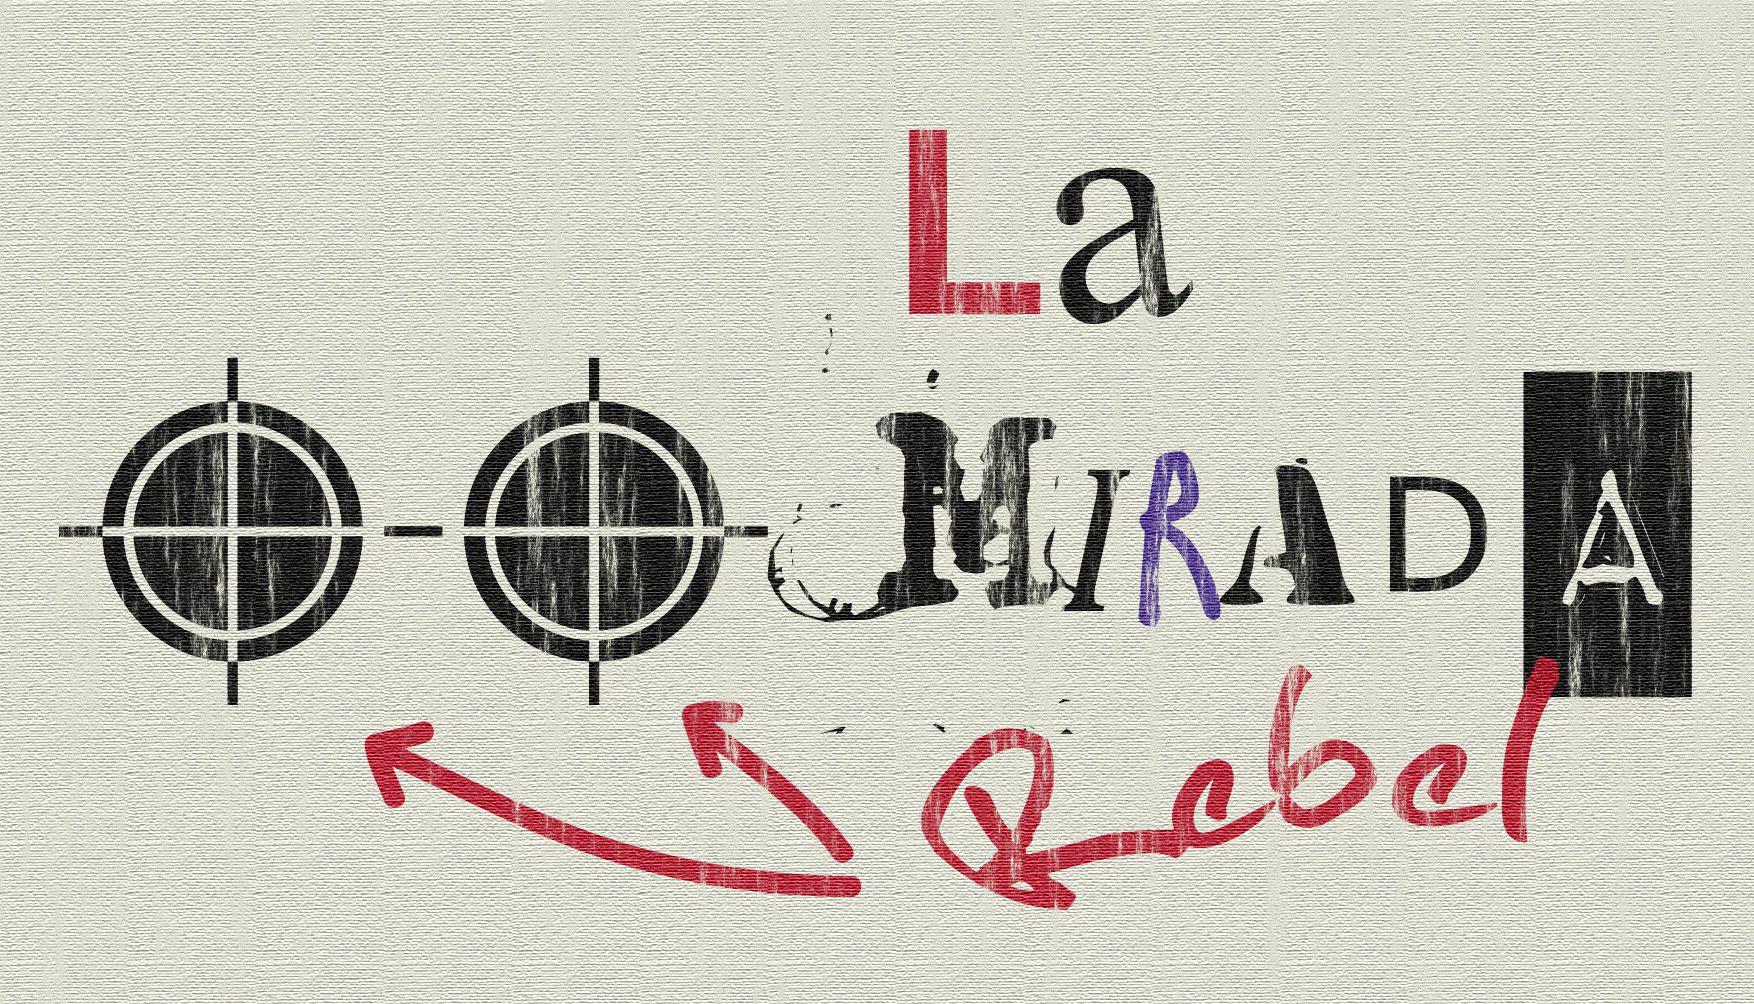 La_mirada_rebel_Postal_A6_v.1.0_vintg_(sin_pie)